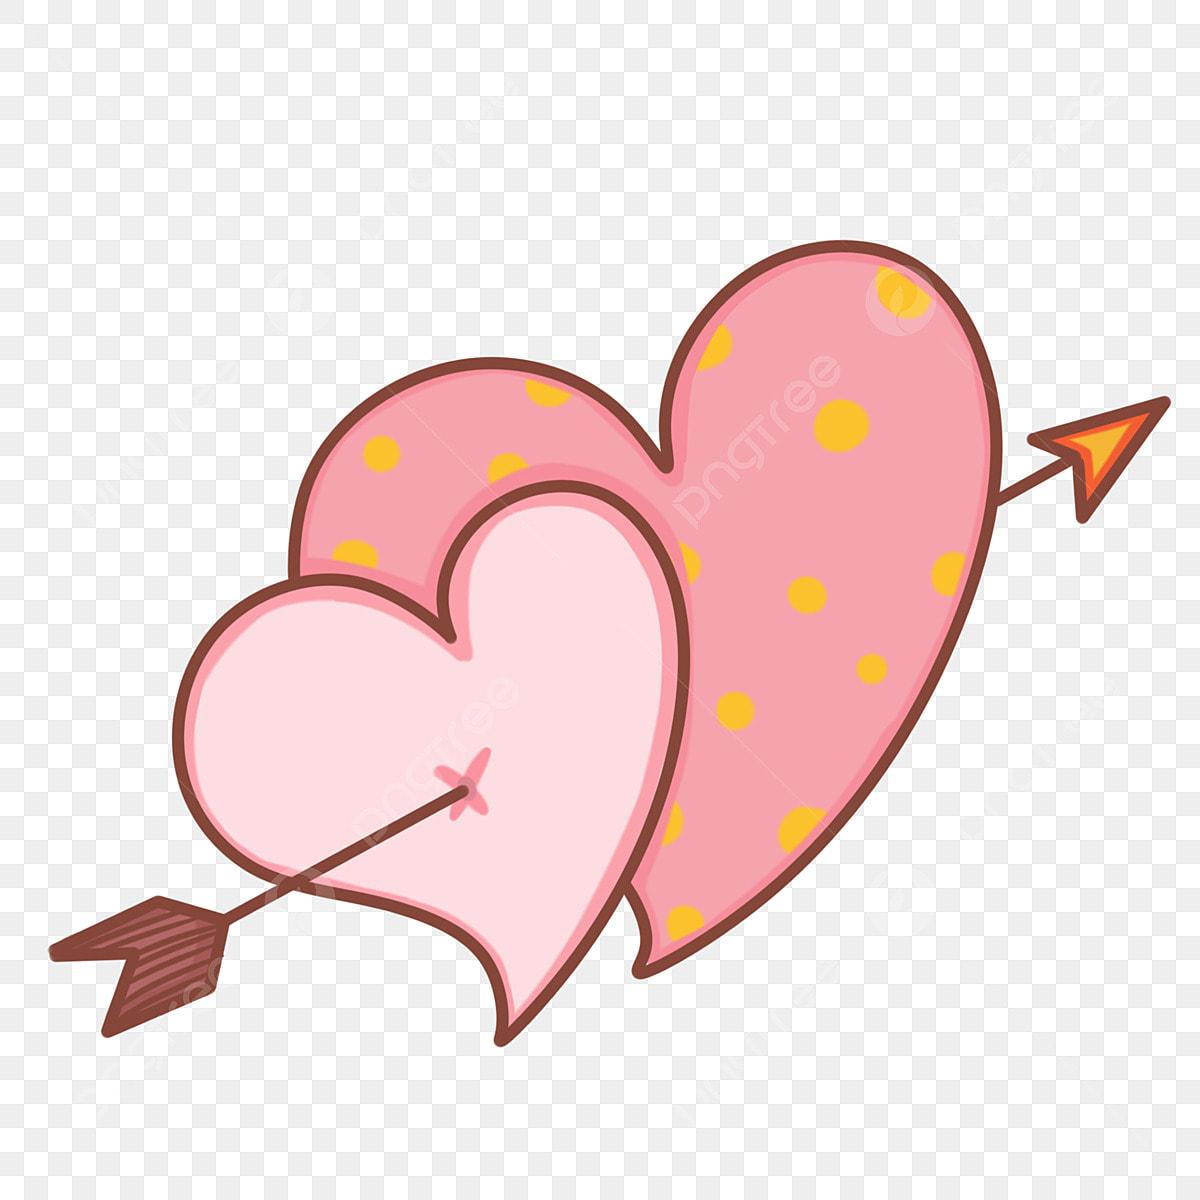 Rose De Pixels En Forme De Coeur Pixel En Forme De Coeur